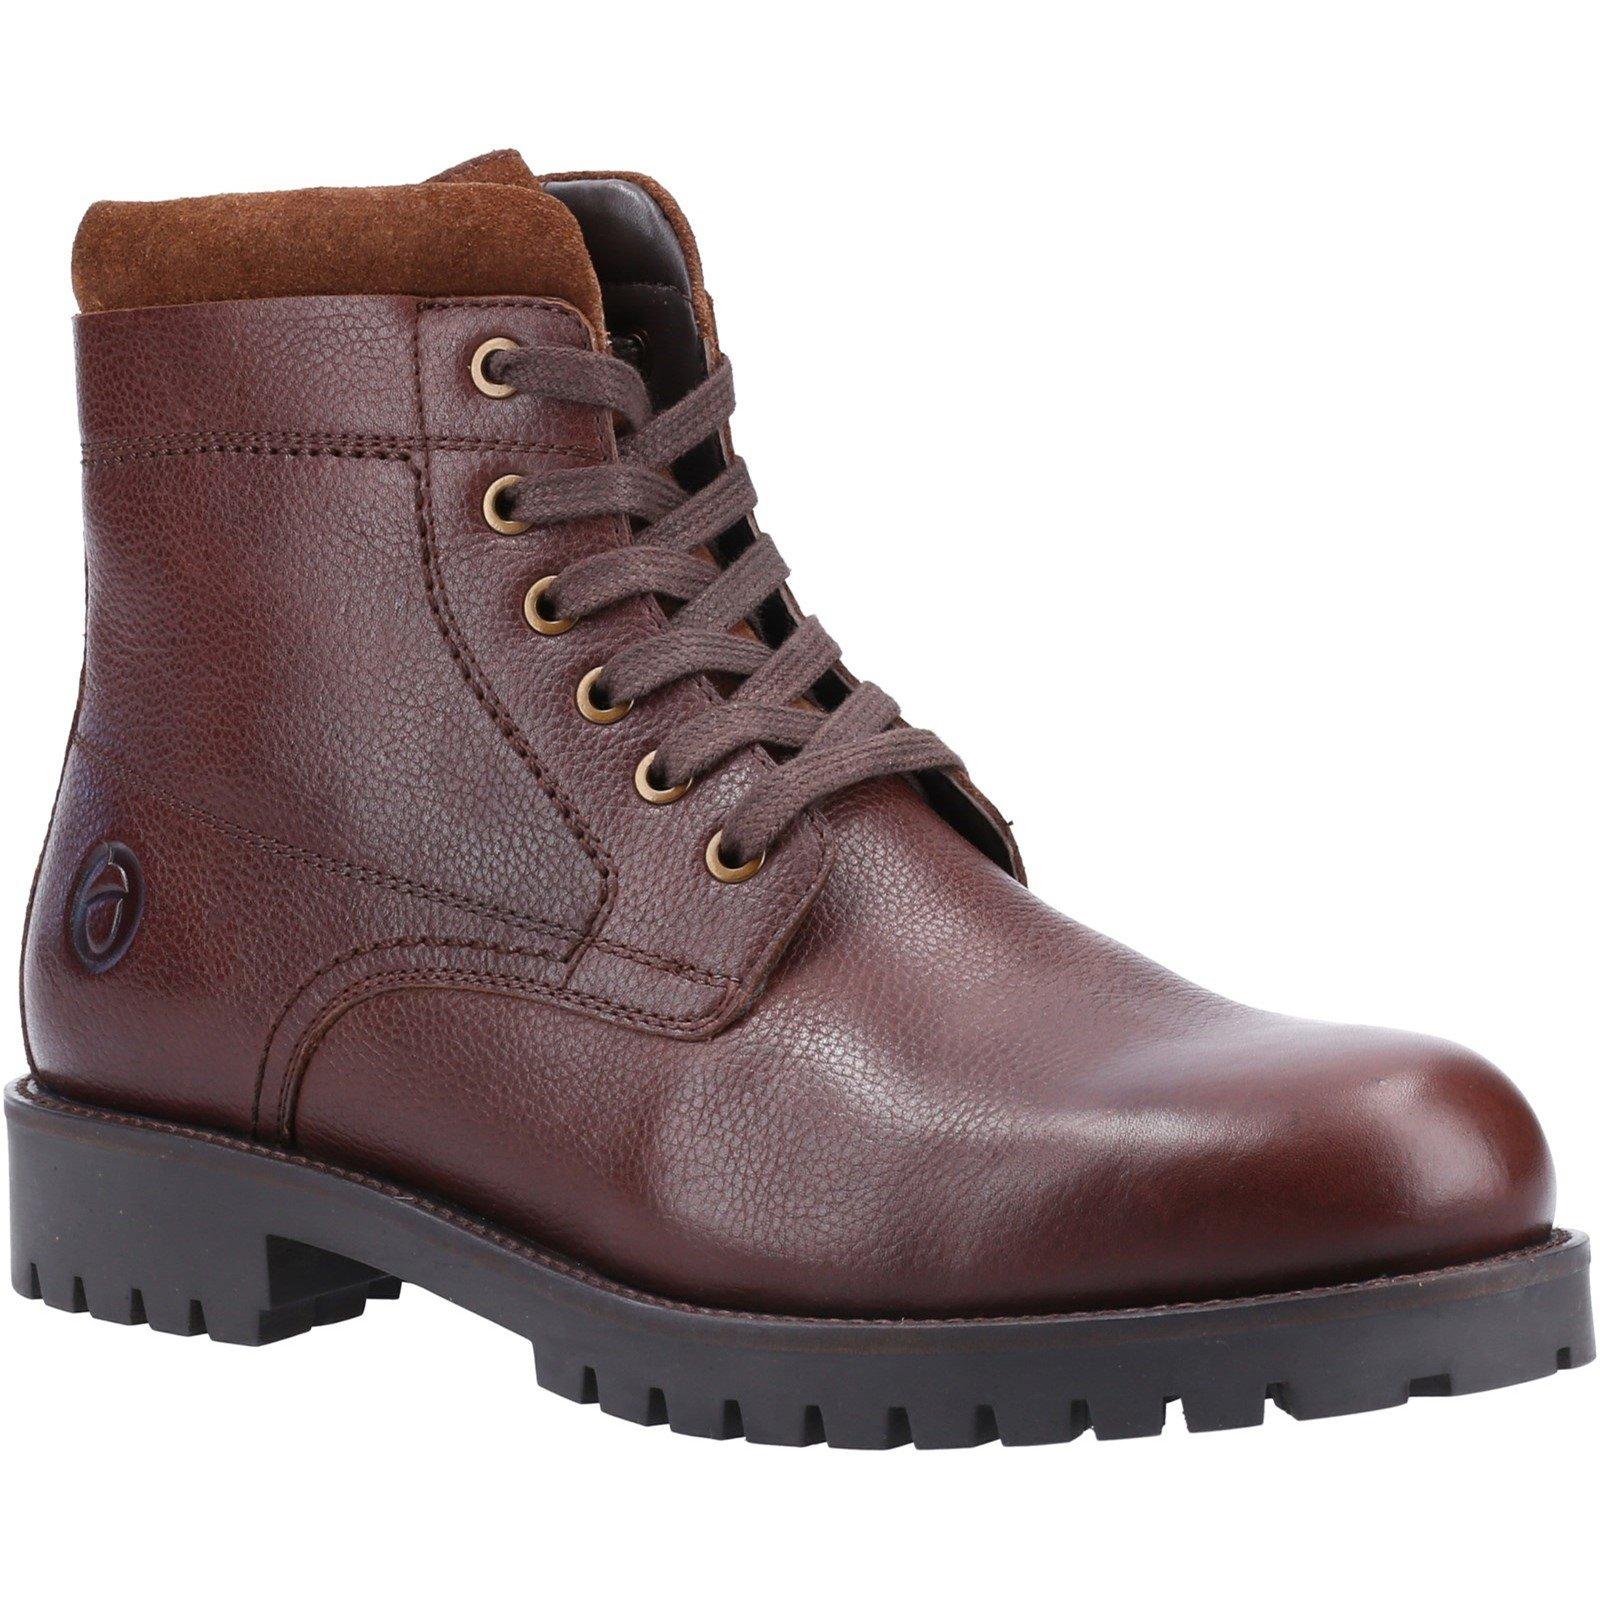 Cotswold Men's Thorsbury Lace Up Shoe Boot Various Colours 32963 - Brown 10